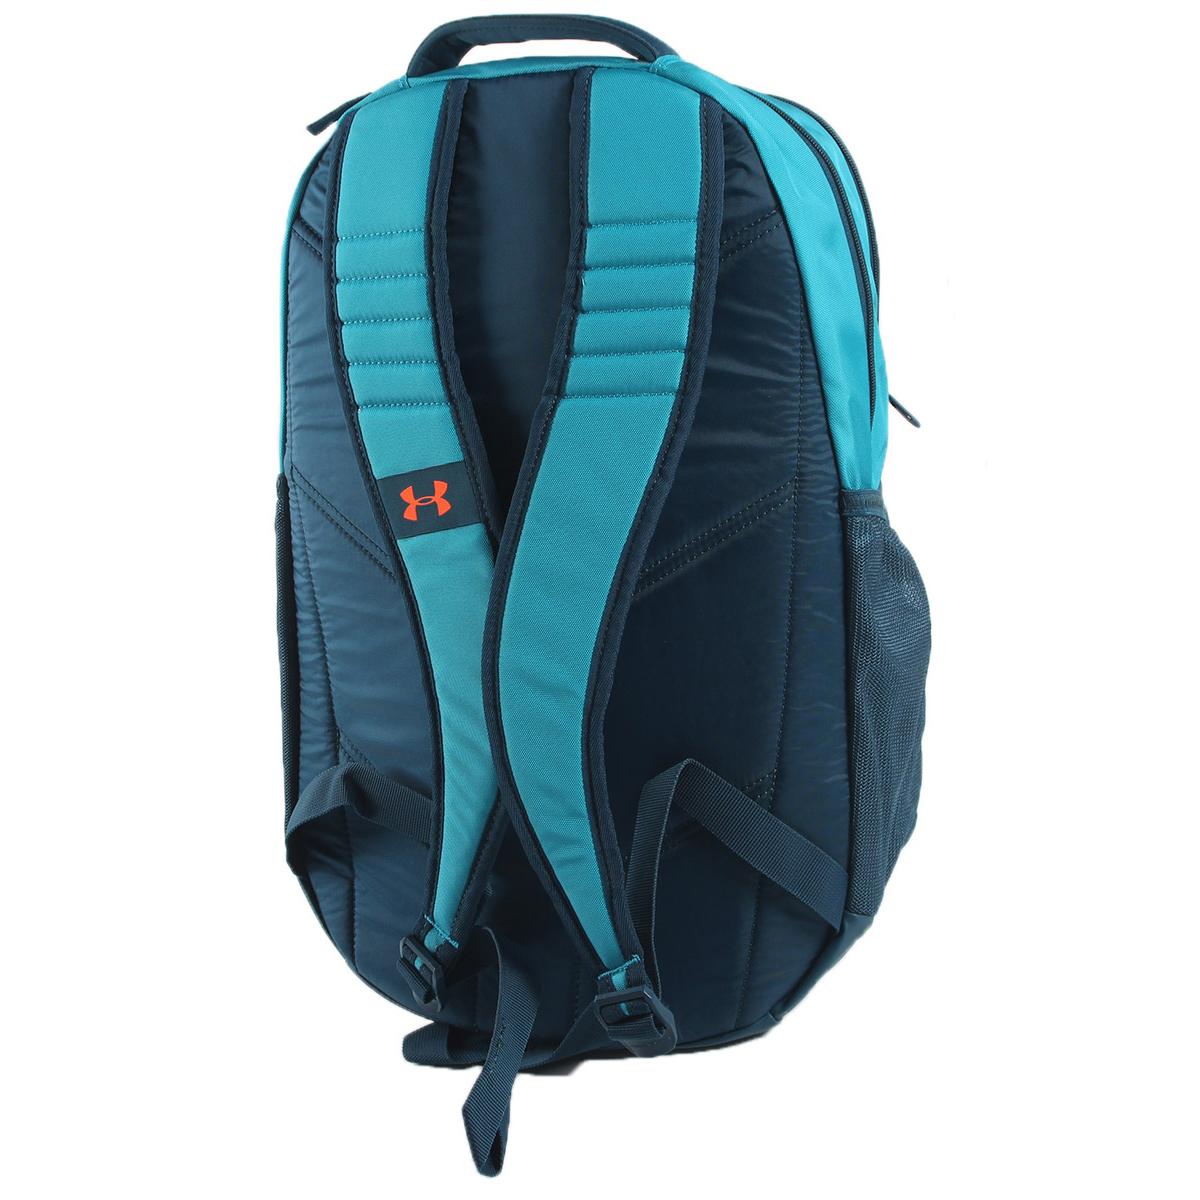 3beeadff94 Under Armour Hustle 3.0 Backpack